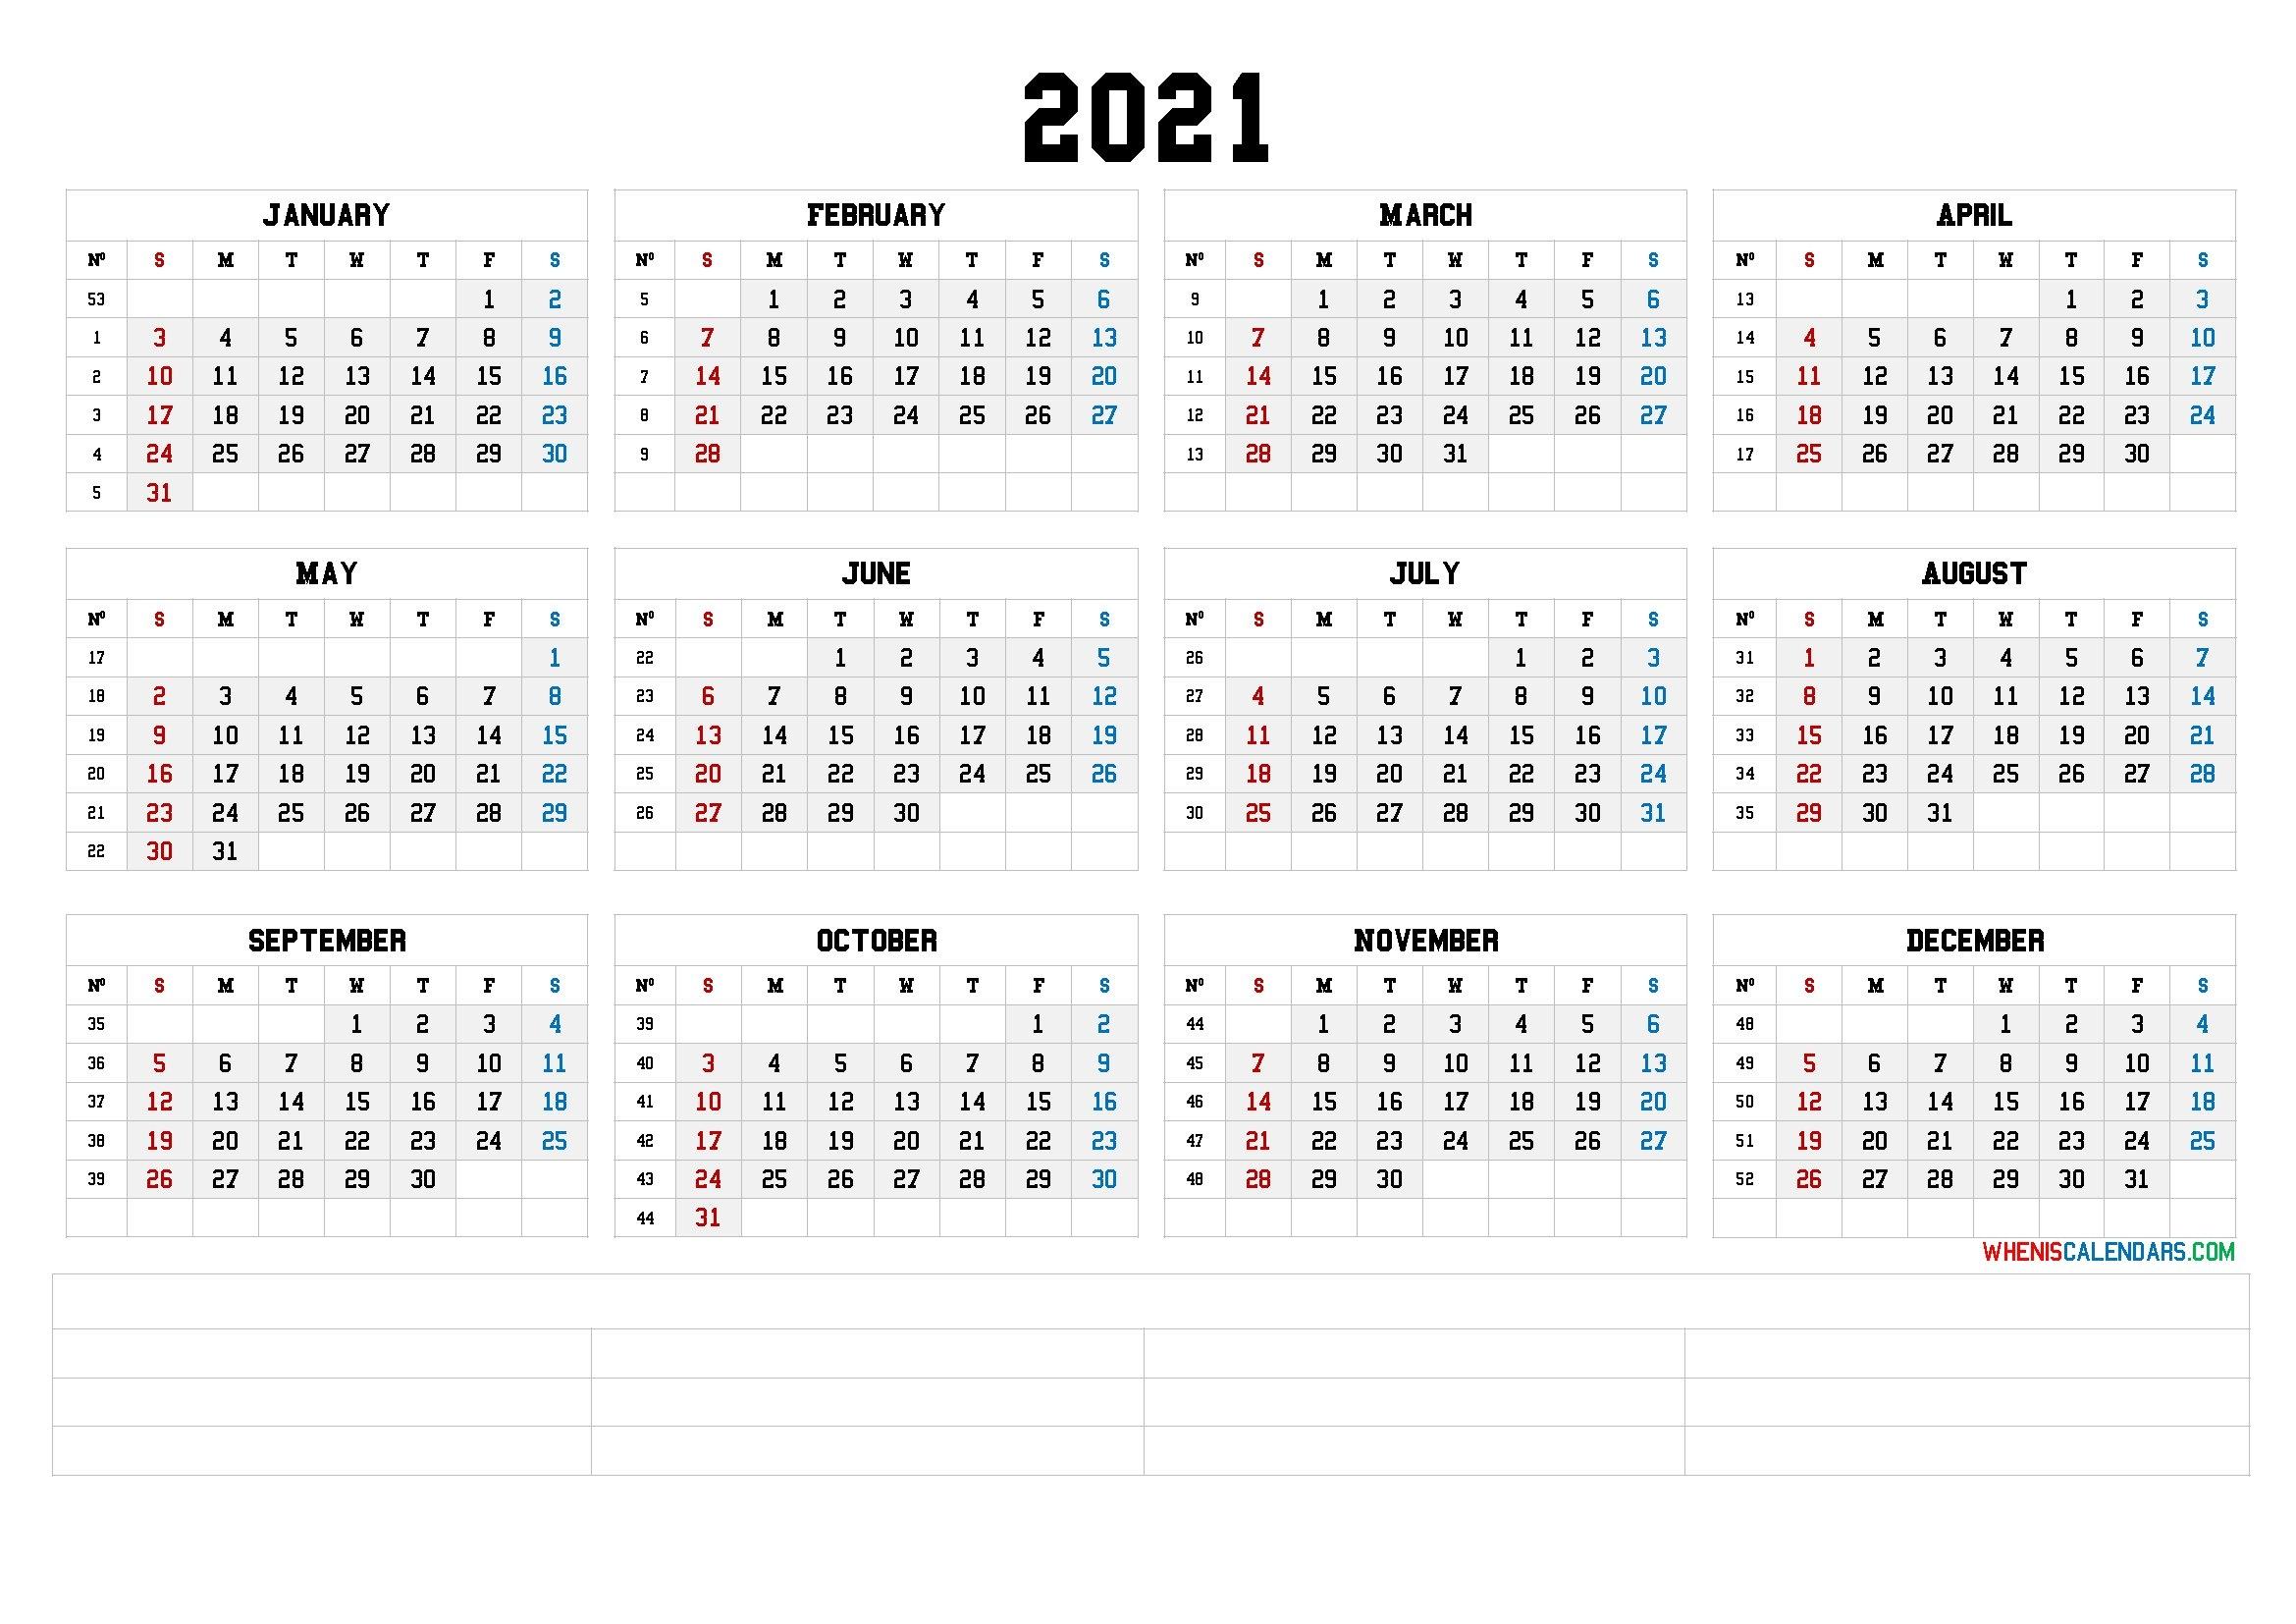 12 Month Calendar Printable 2021 (6 Templates) throughout Printable Calendar 2021 Monthly With Notes